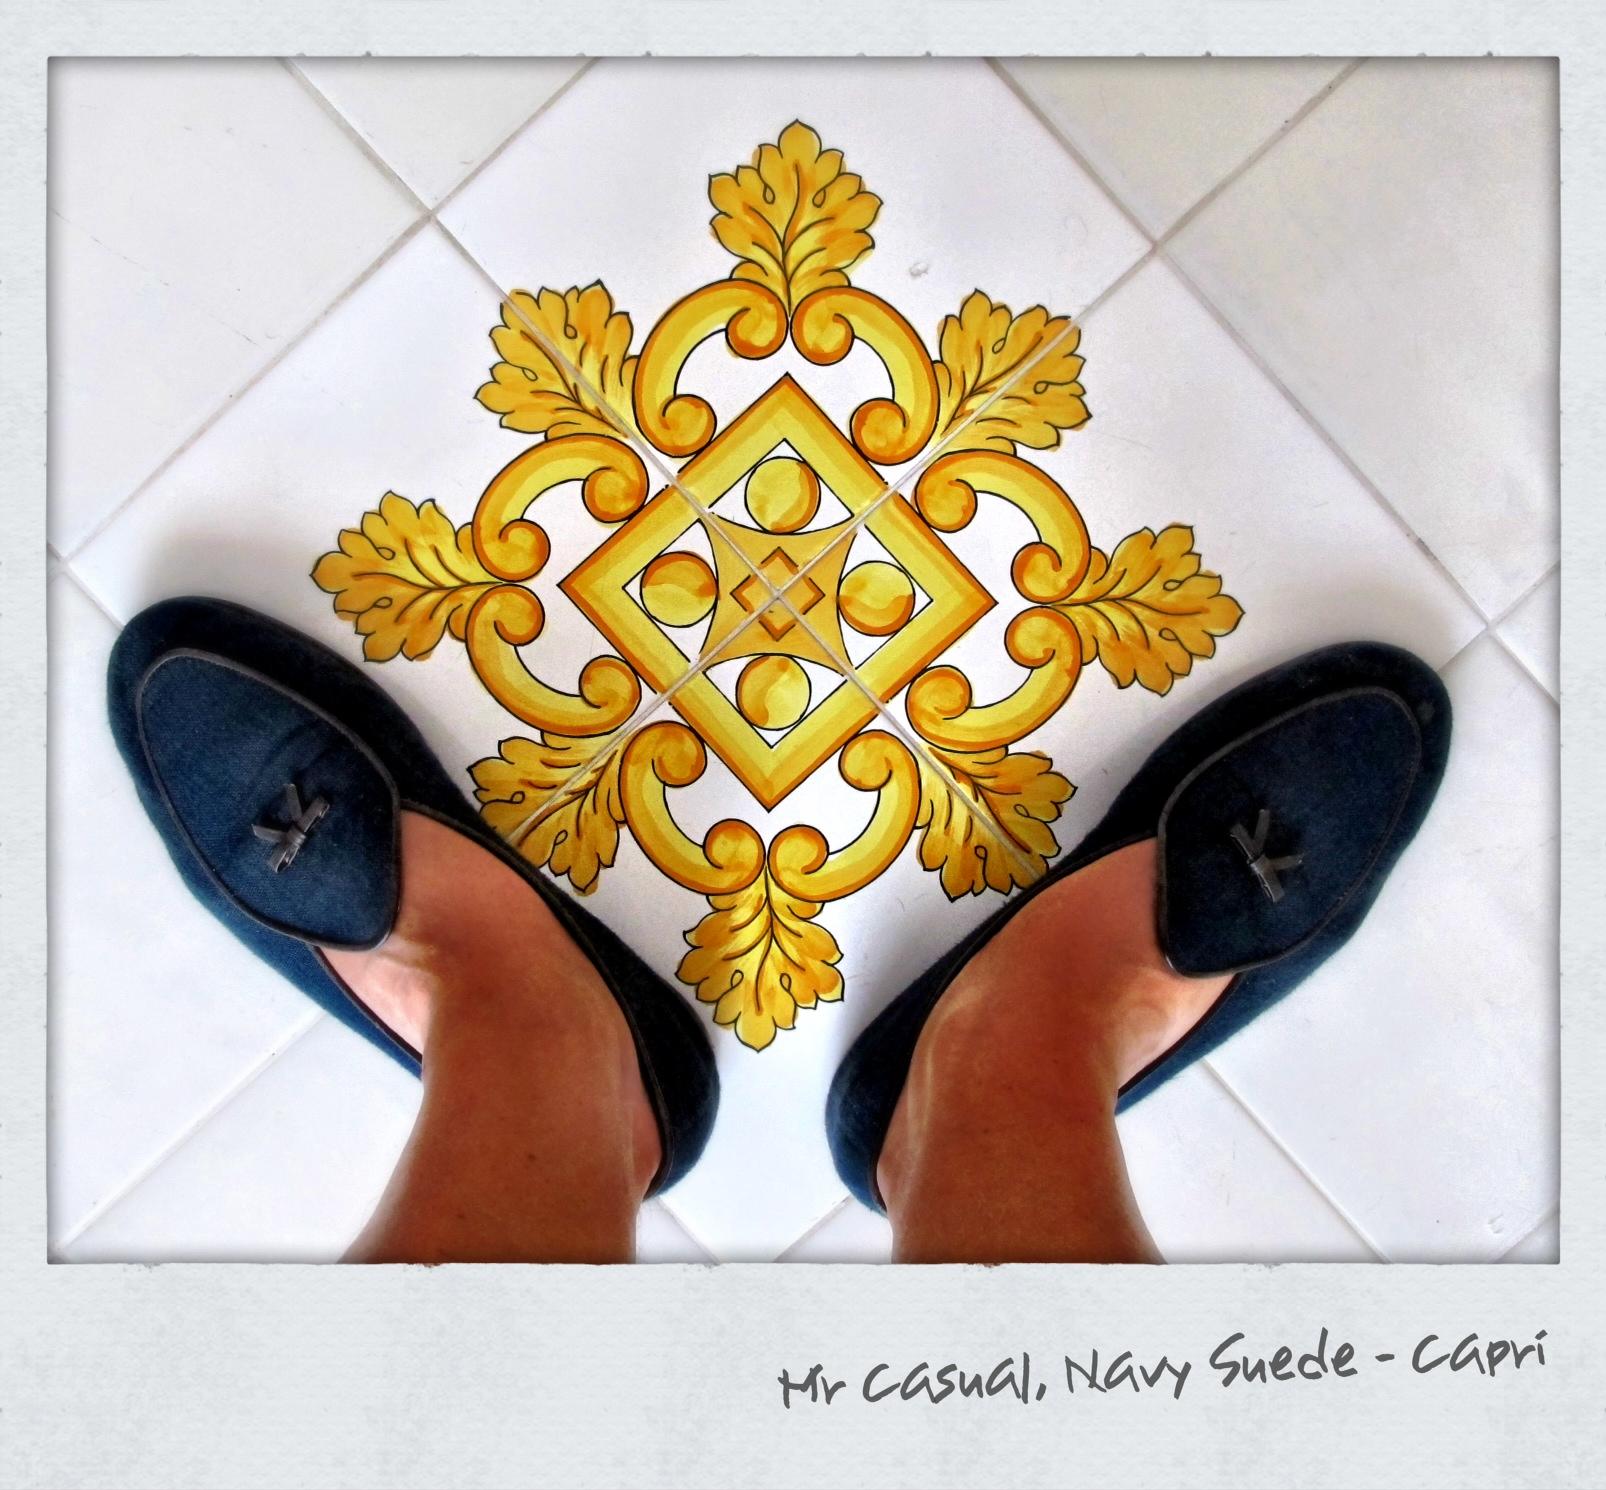 Belgian Shoes - Capri Aug 2012 (1).JPG